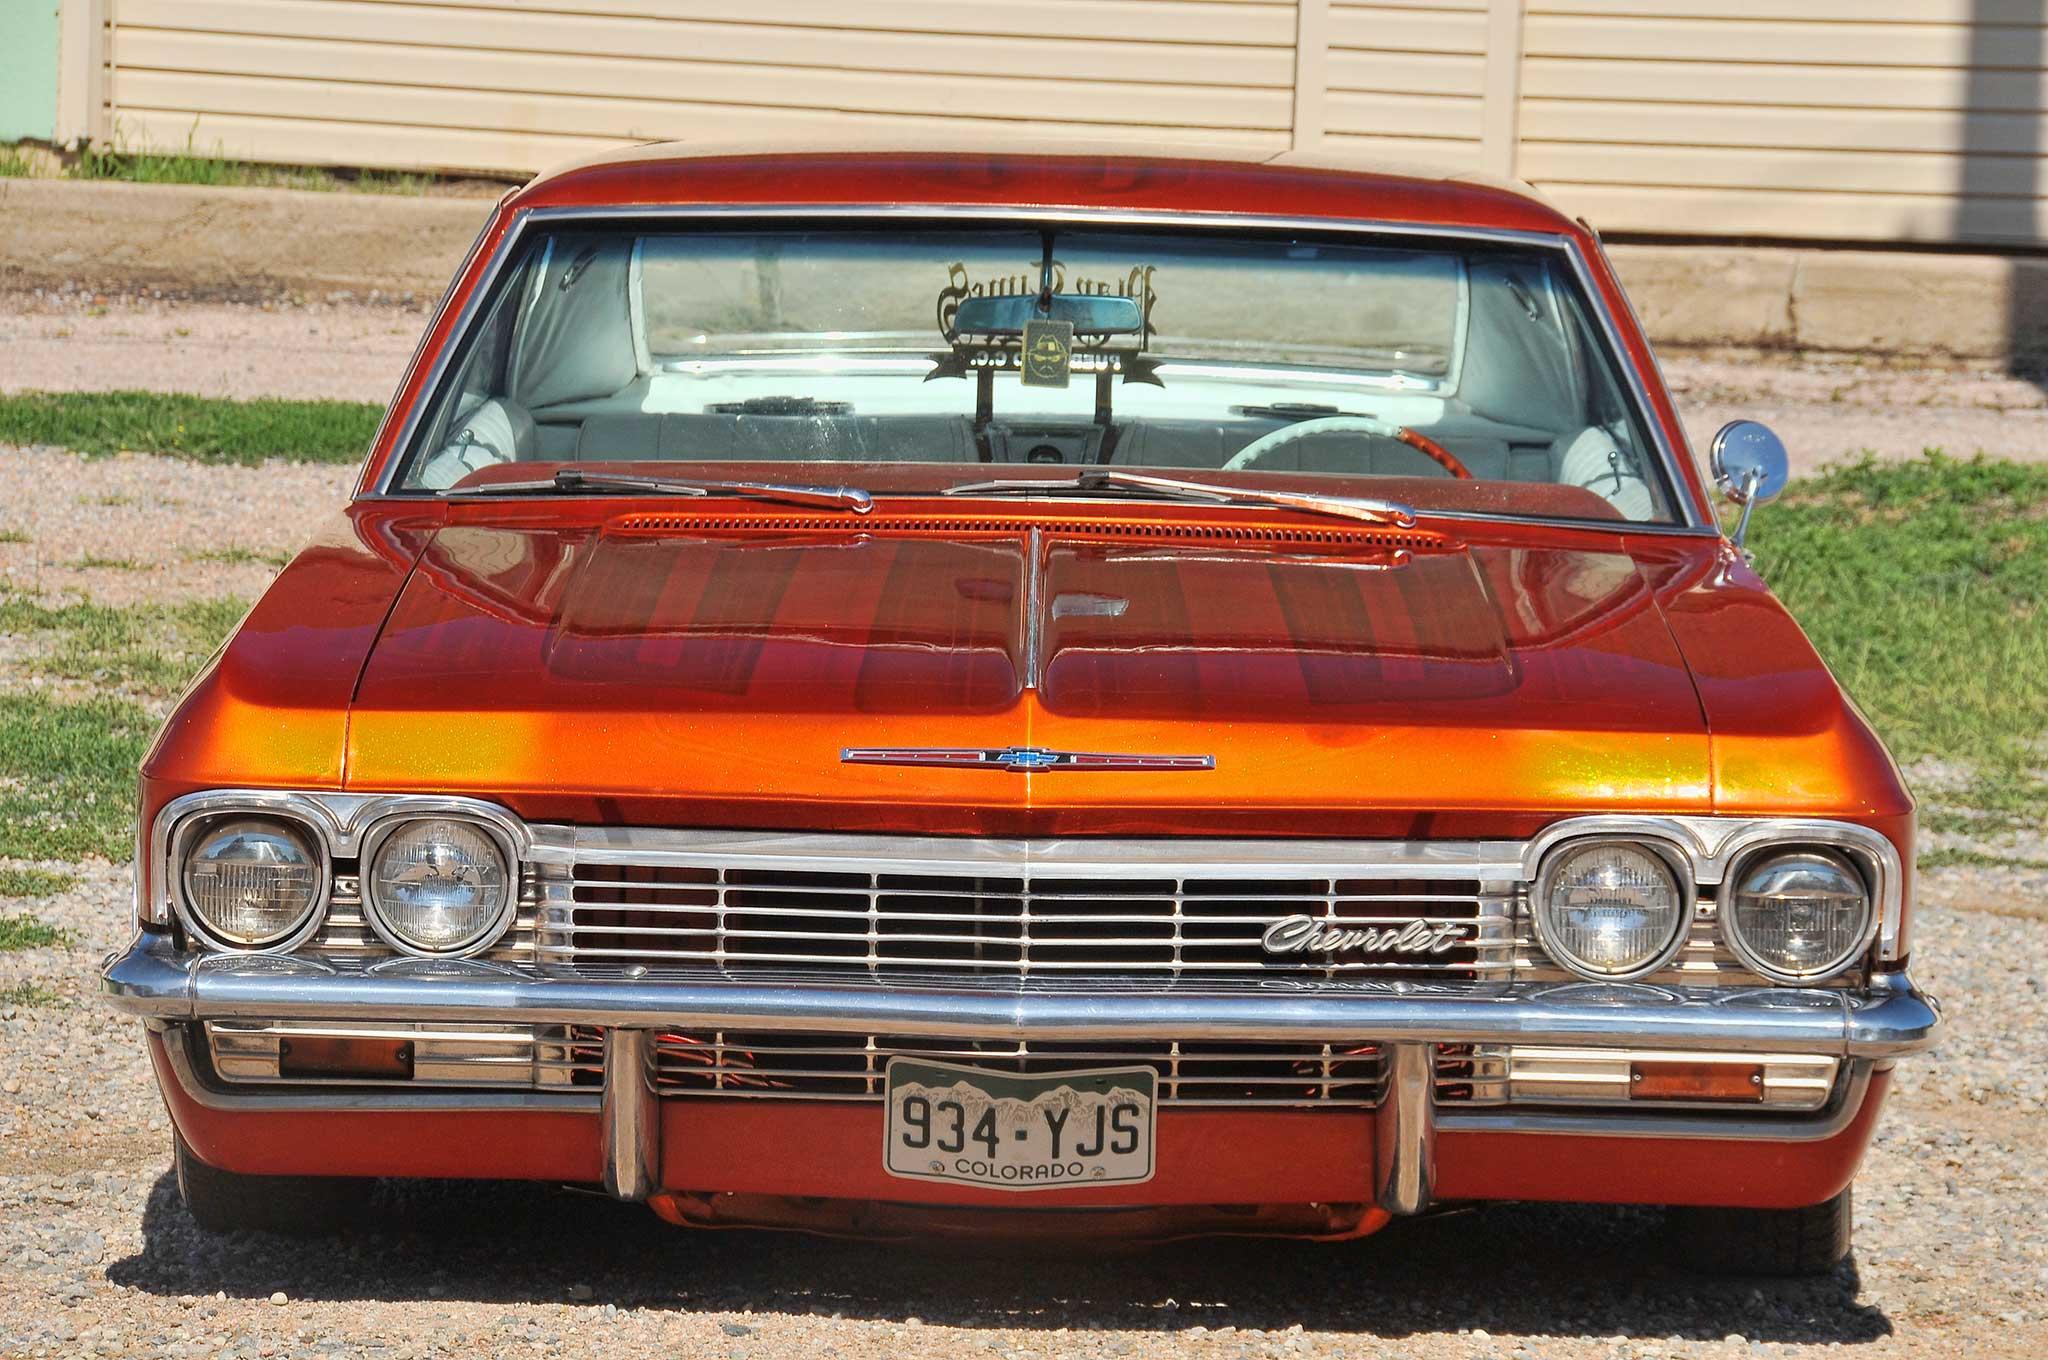 1965 Chevrolet Impala - Side Piece